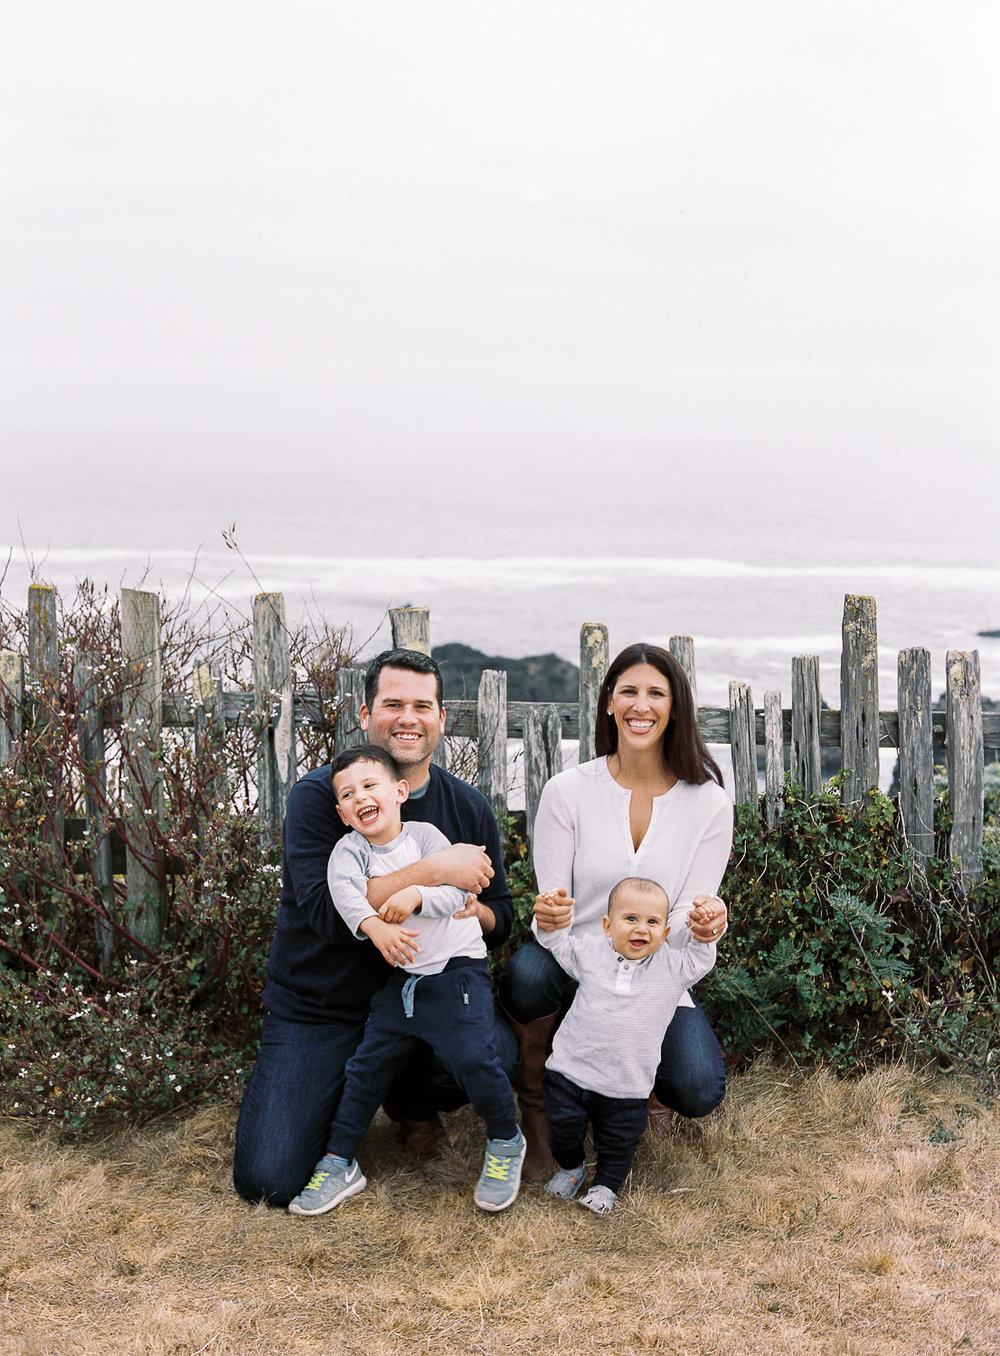 familiesweb0083.jpg